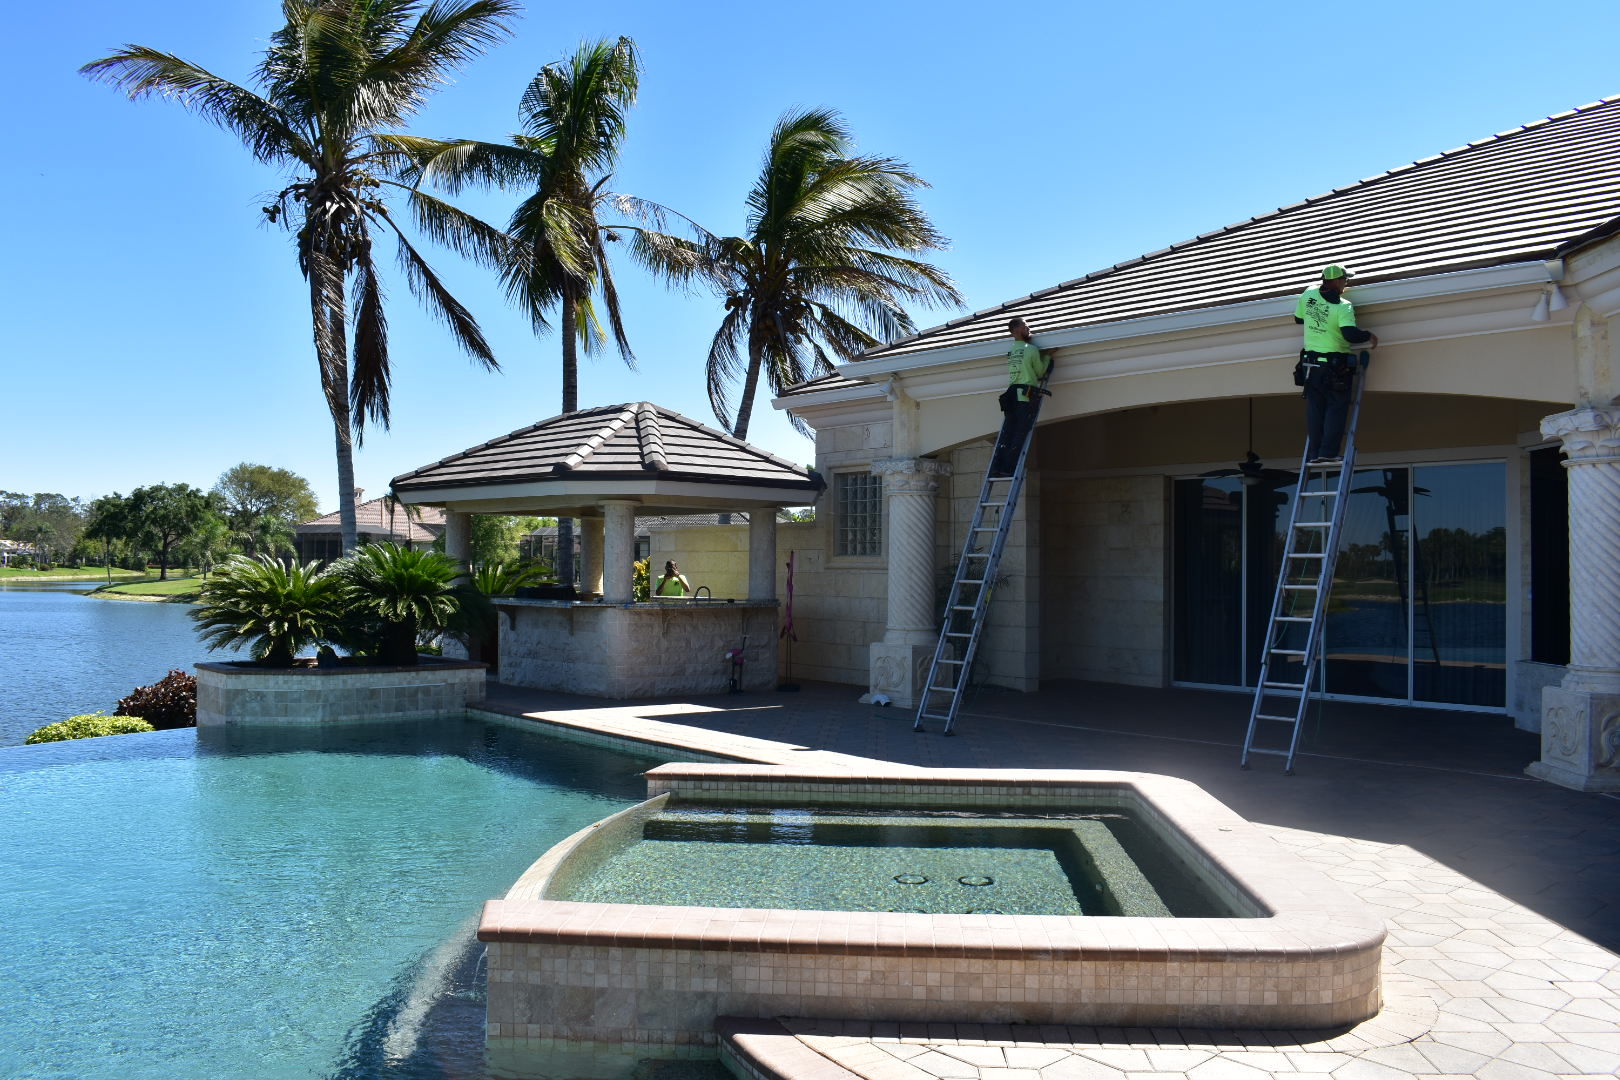 Dsc 0643 3g Home Exteriors Florida